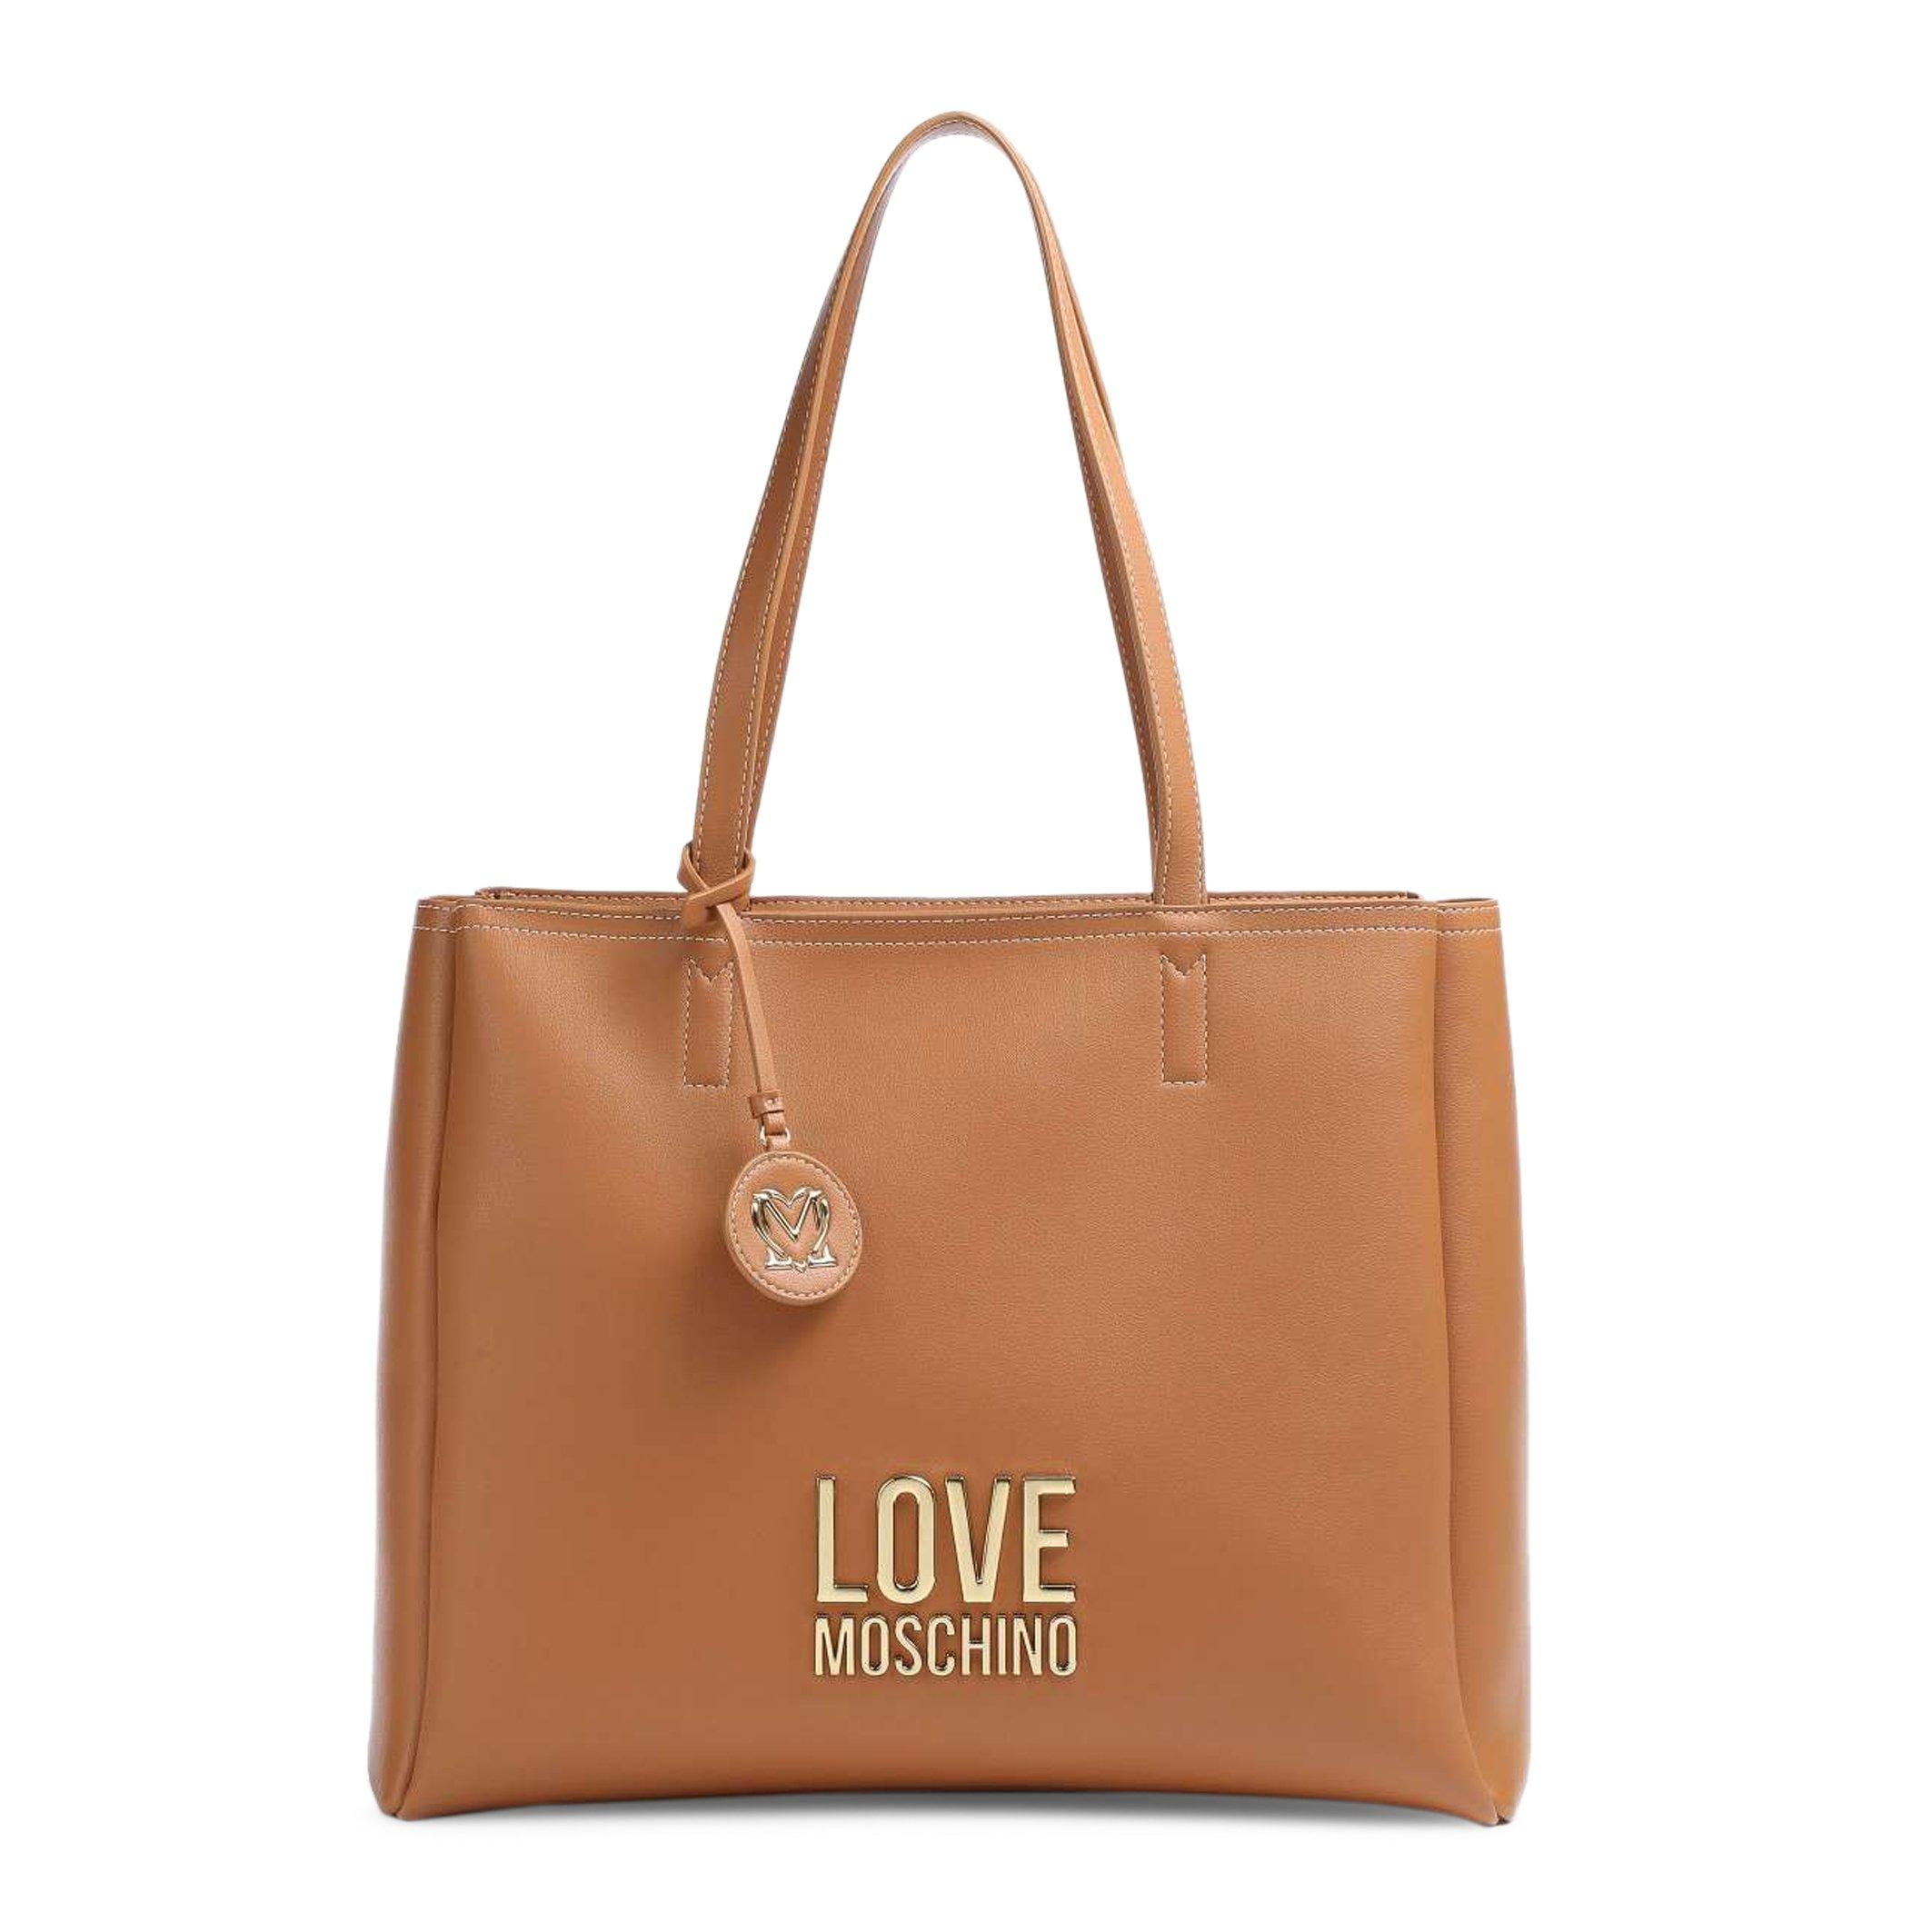 Love Moschino Women's Shopping Bag Various Colours JC4100PP1DLJ0 - brown NOSIZE